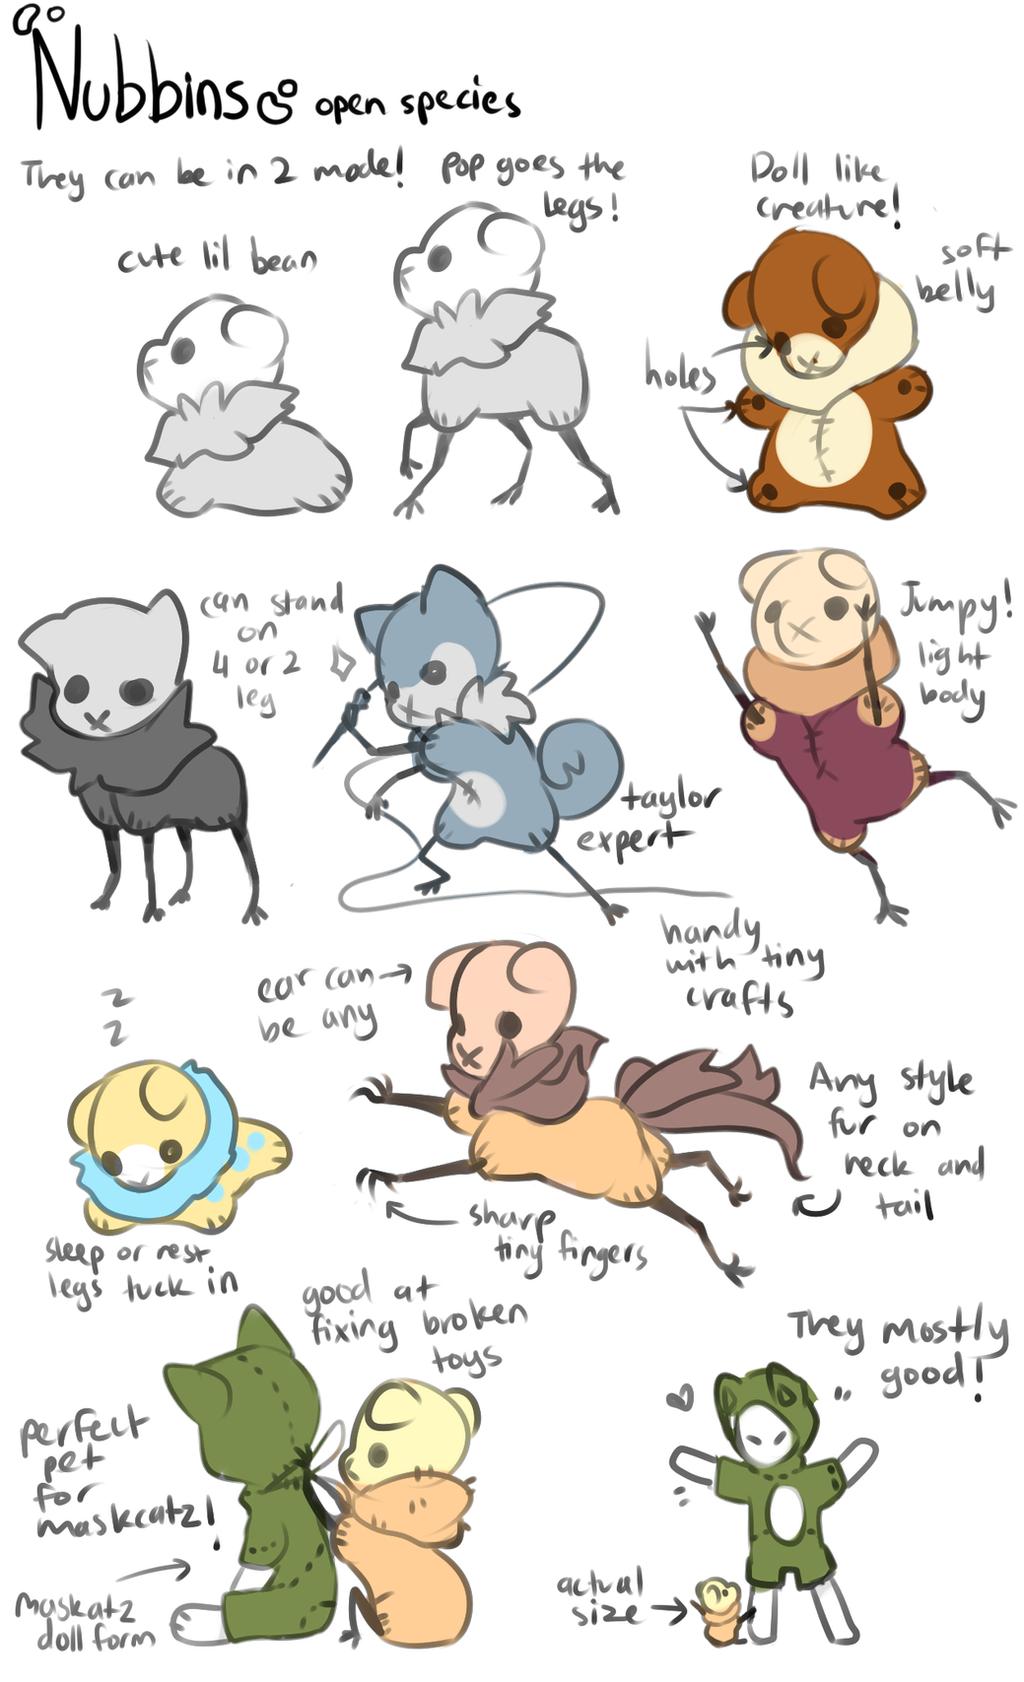 Nubbins open species! by onigiryStuff